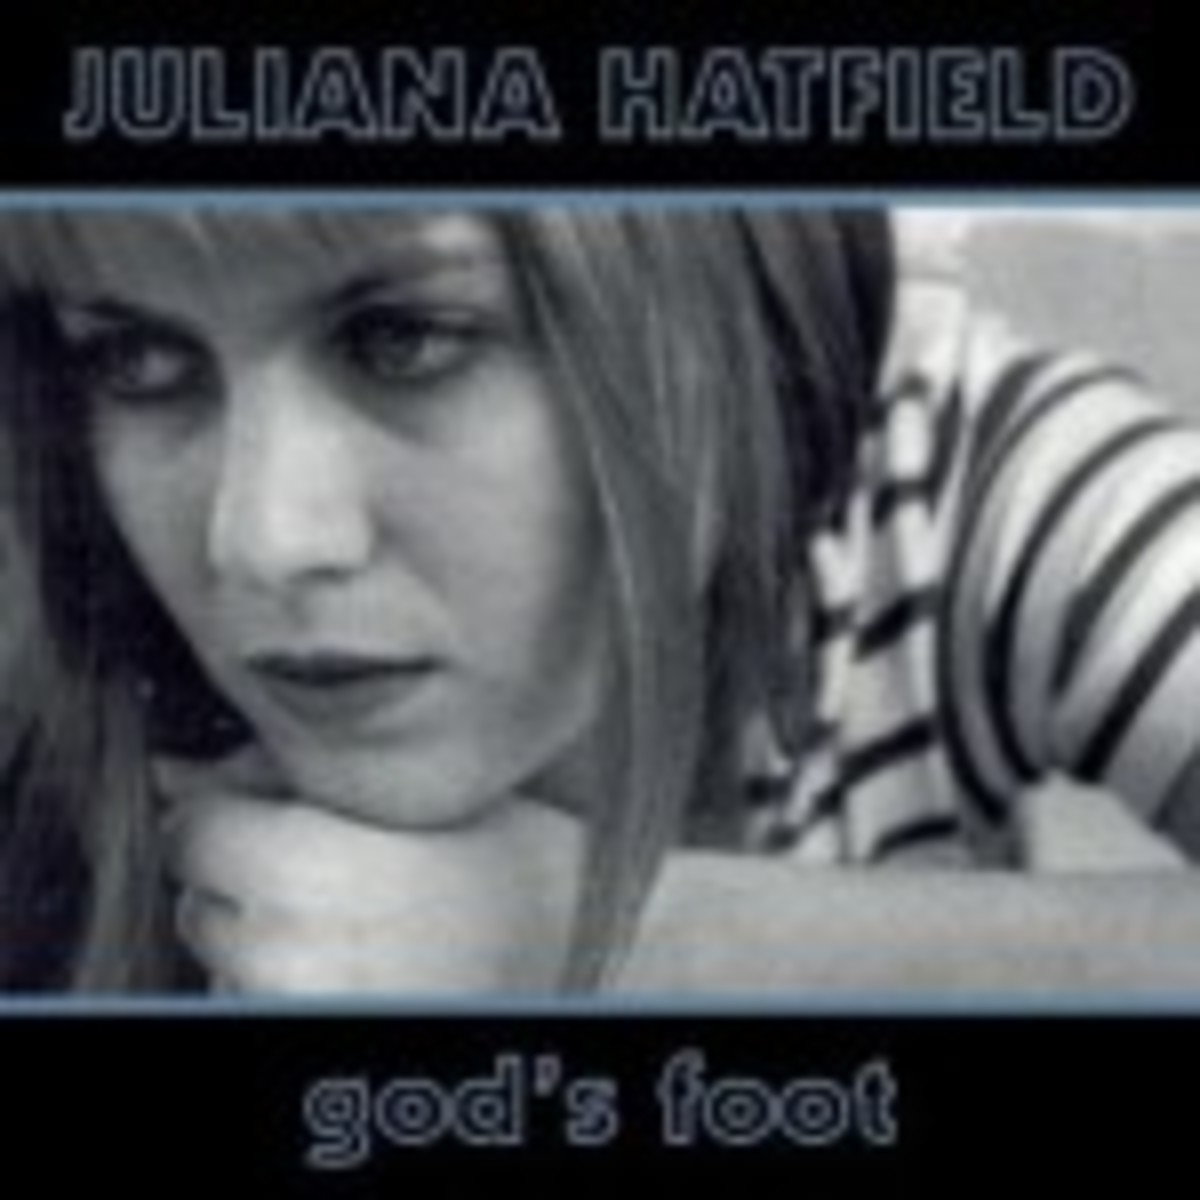 Juliana Hatfield God's Foot